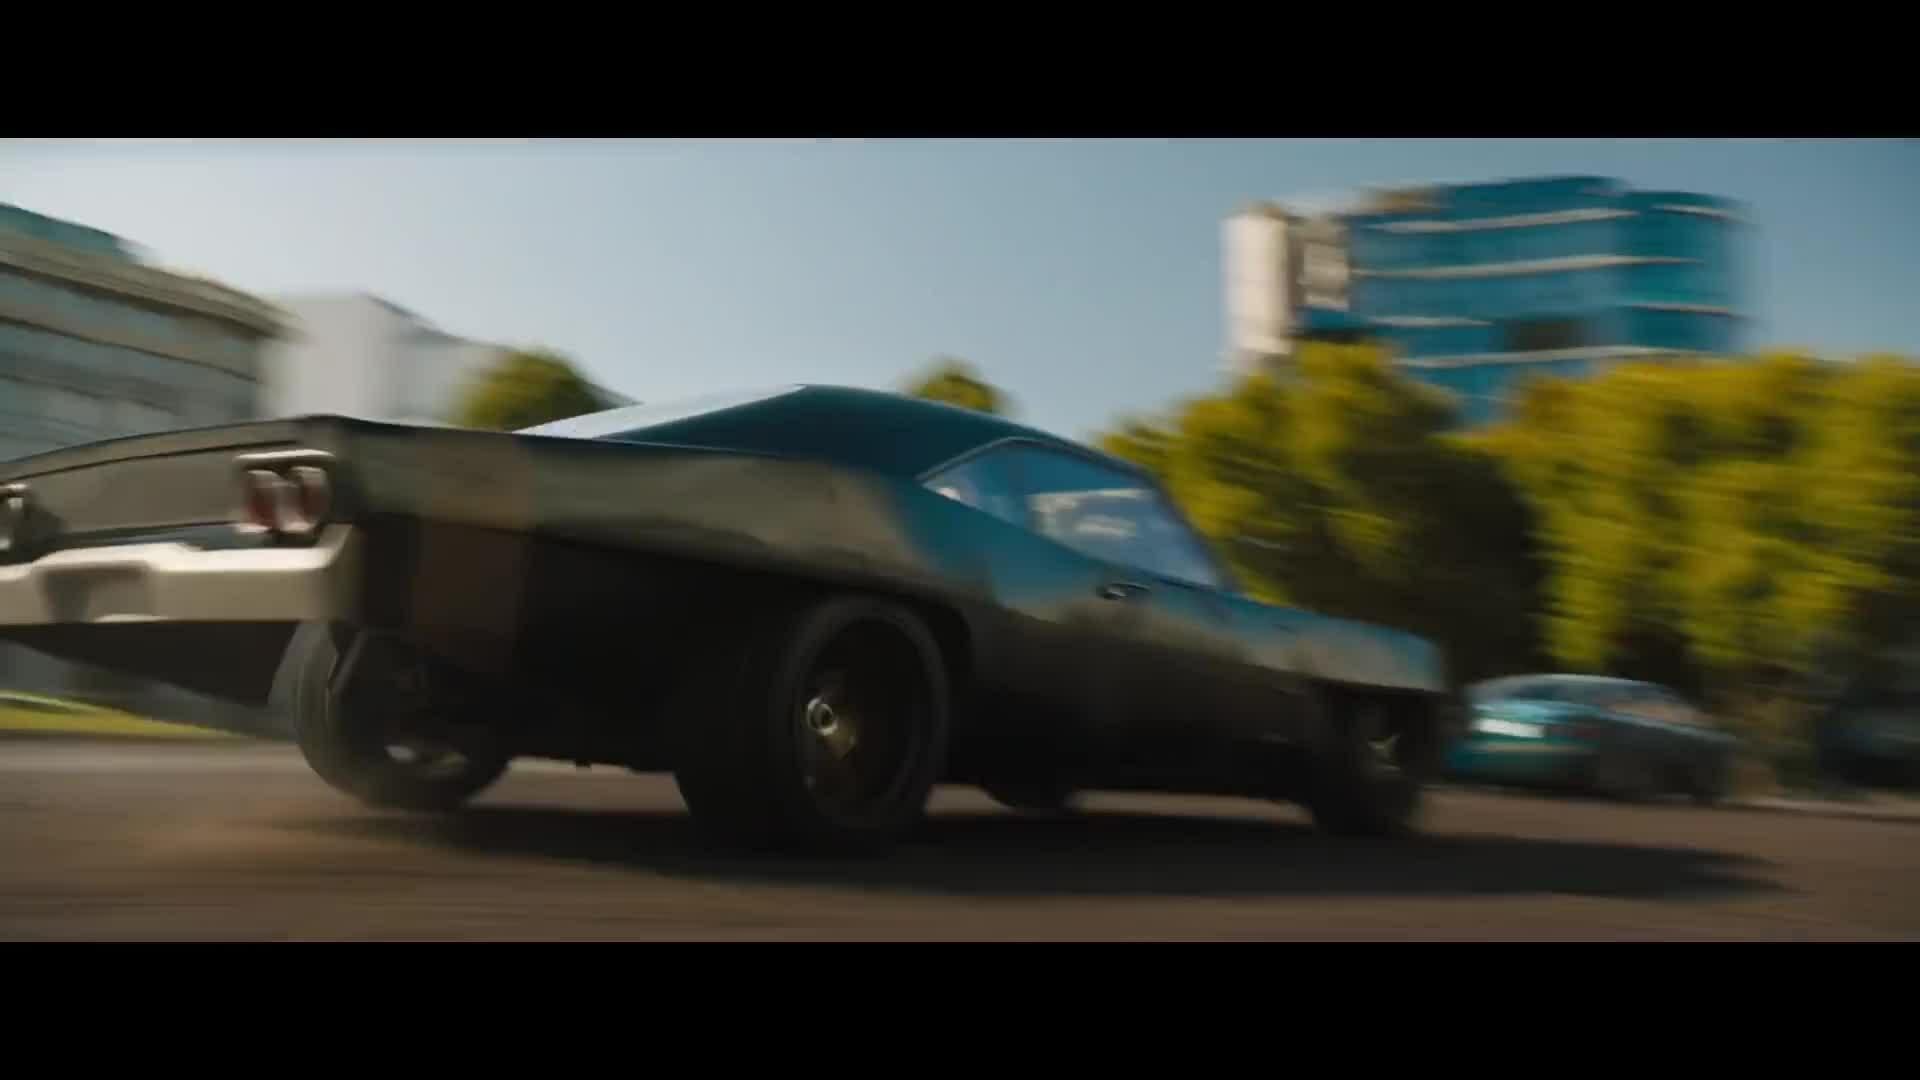 Ê-kíp 'Fast 9' phá hủy 200 ôtô